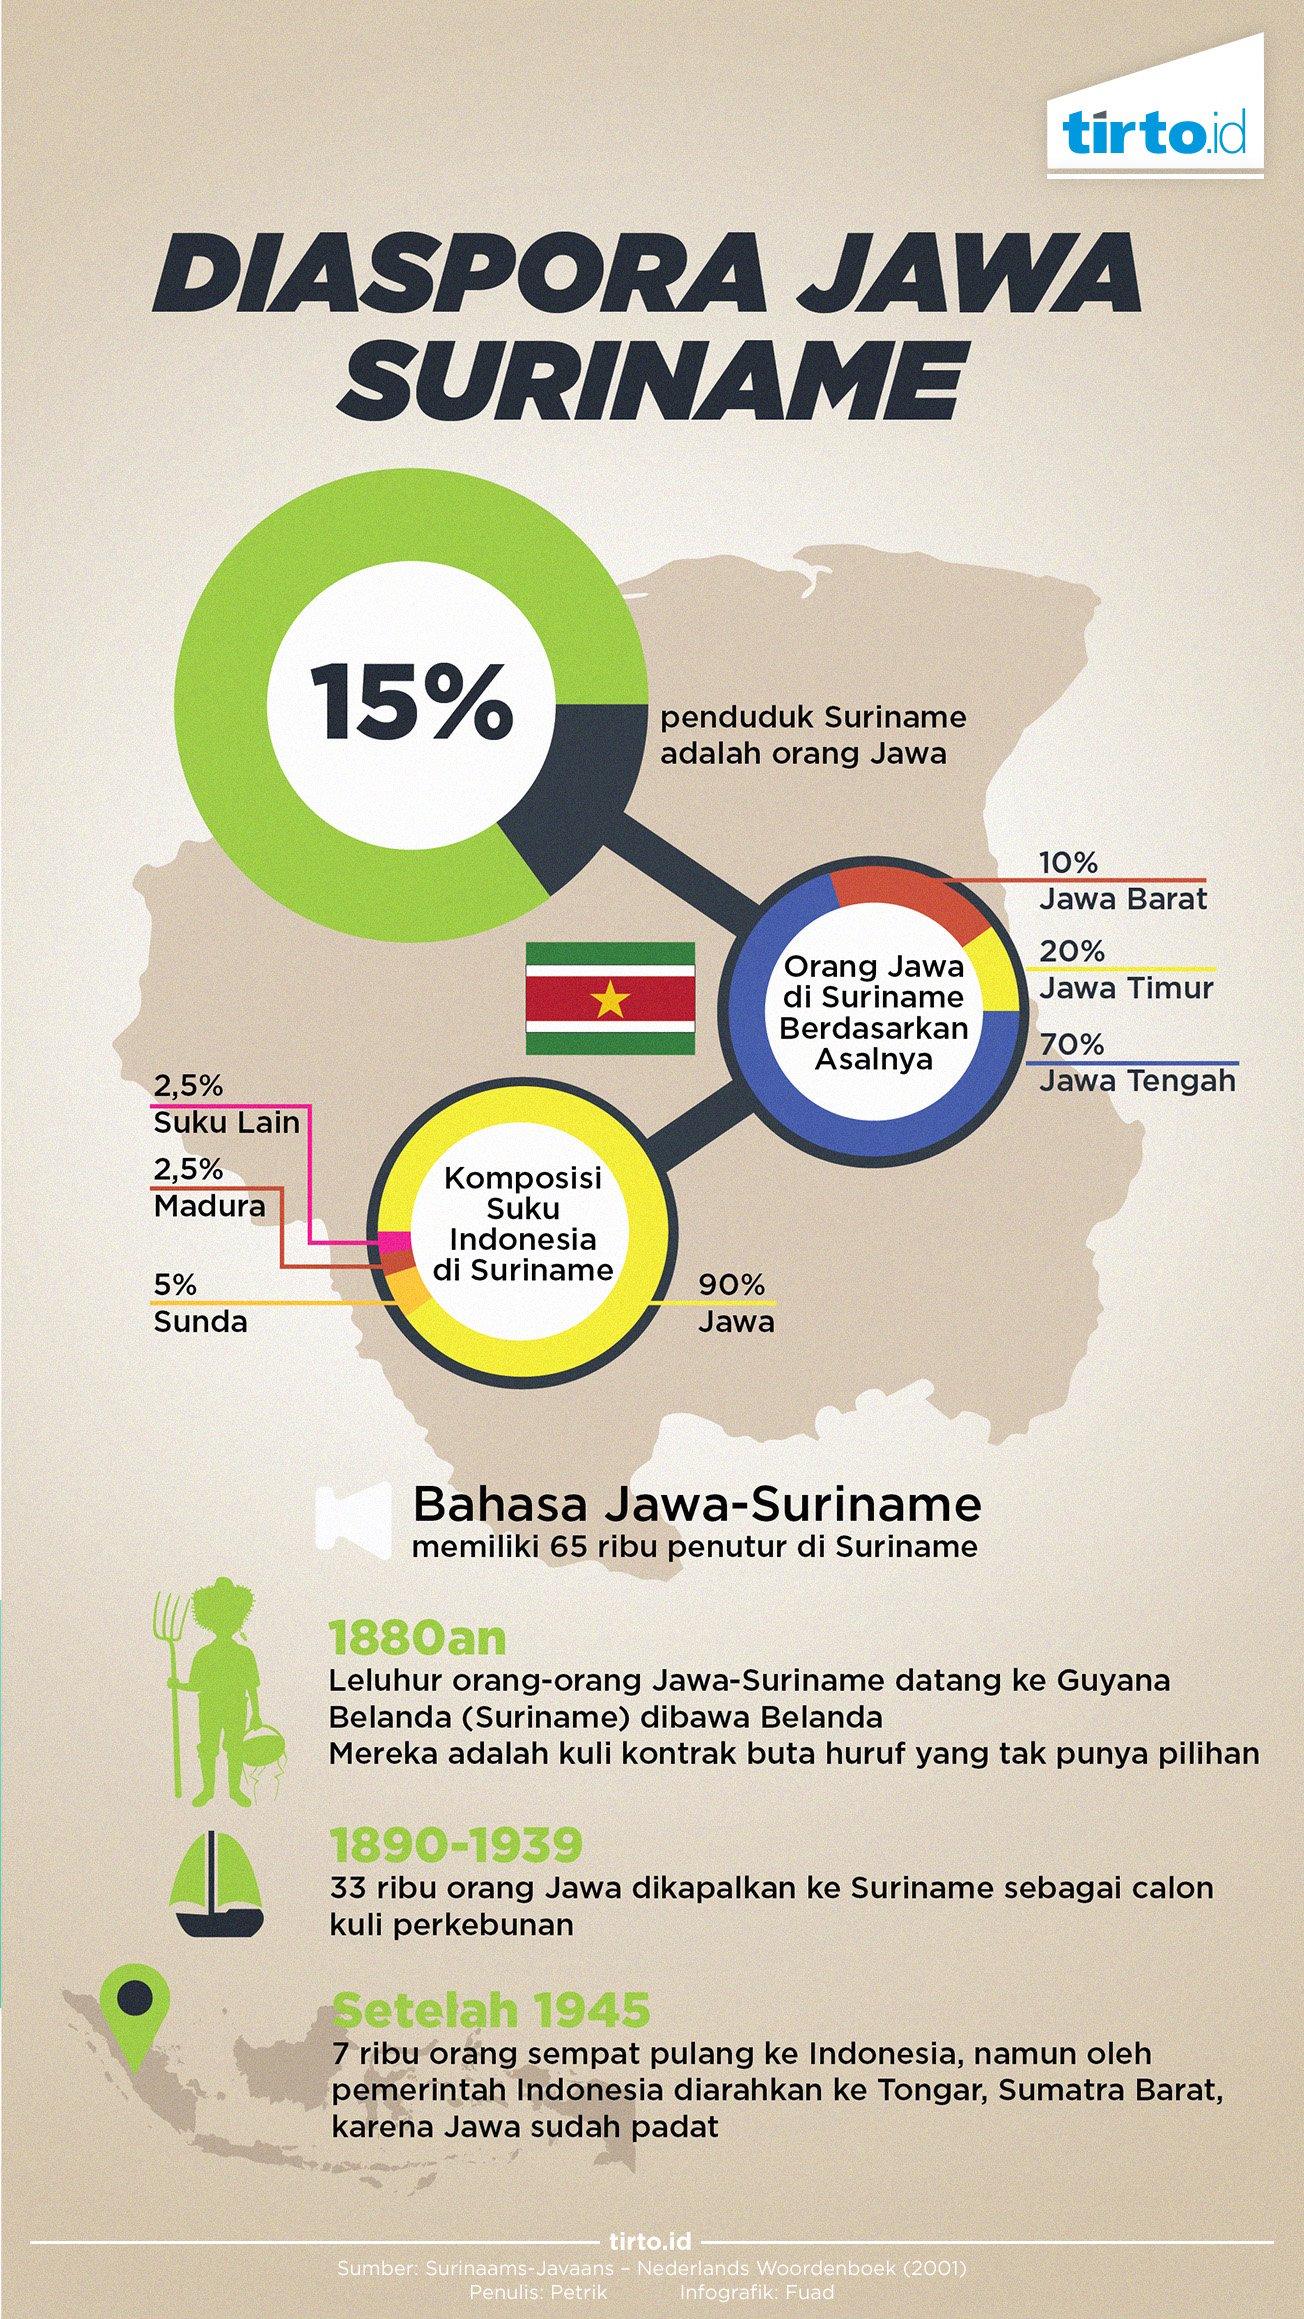 Orang Orang Jawa Di Suriname Tirto ID